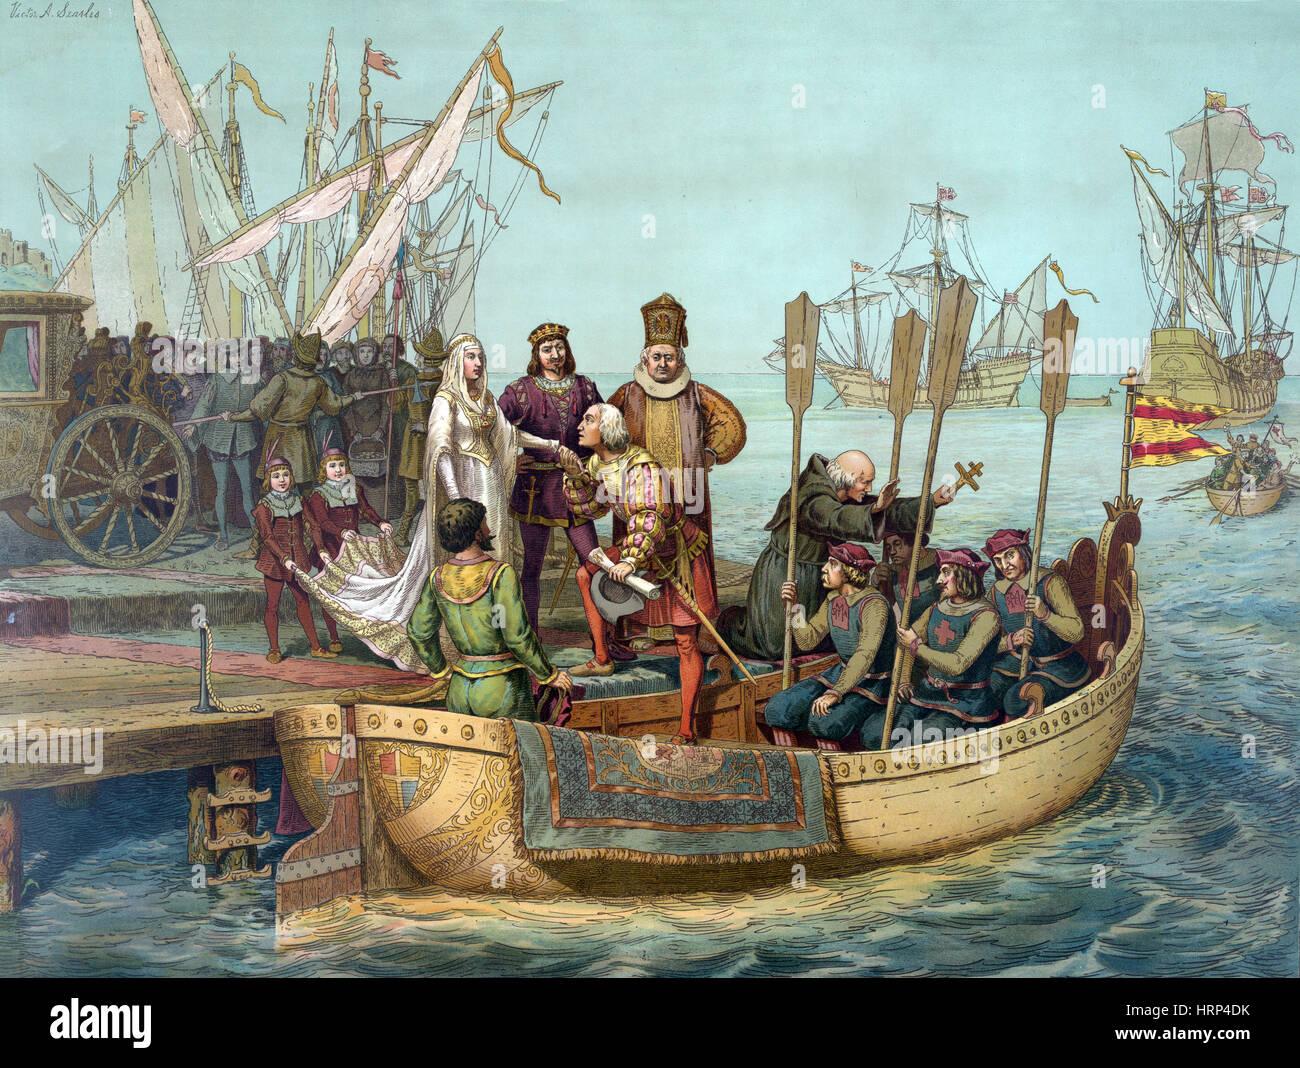 Atemberaubend Erste Reise von Christoph Kolumbus, 1492 Stockfoto, Bild @OO_18